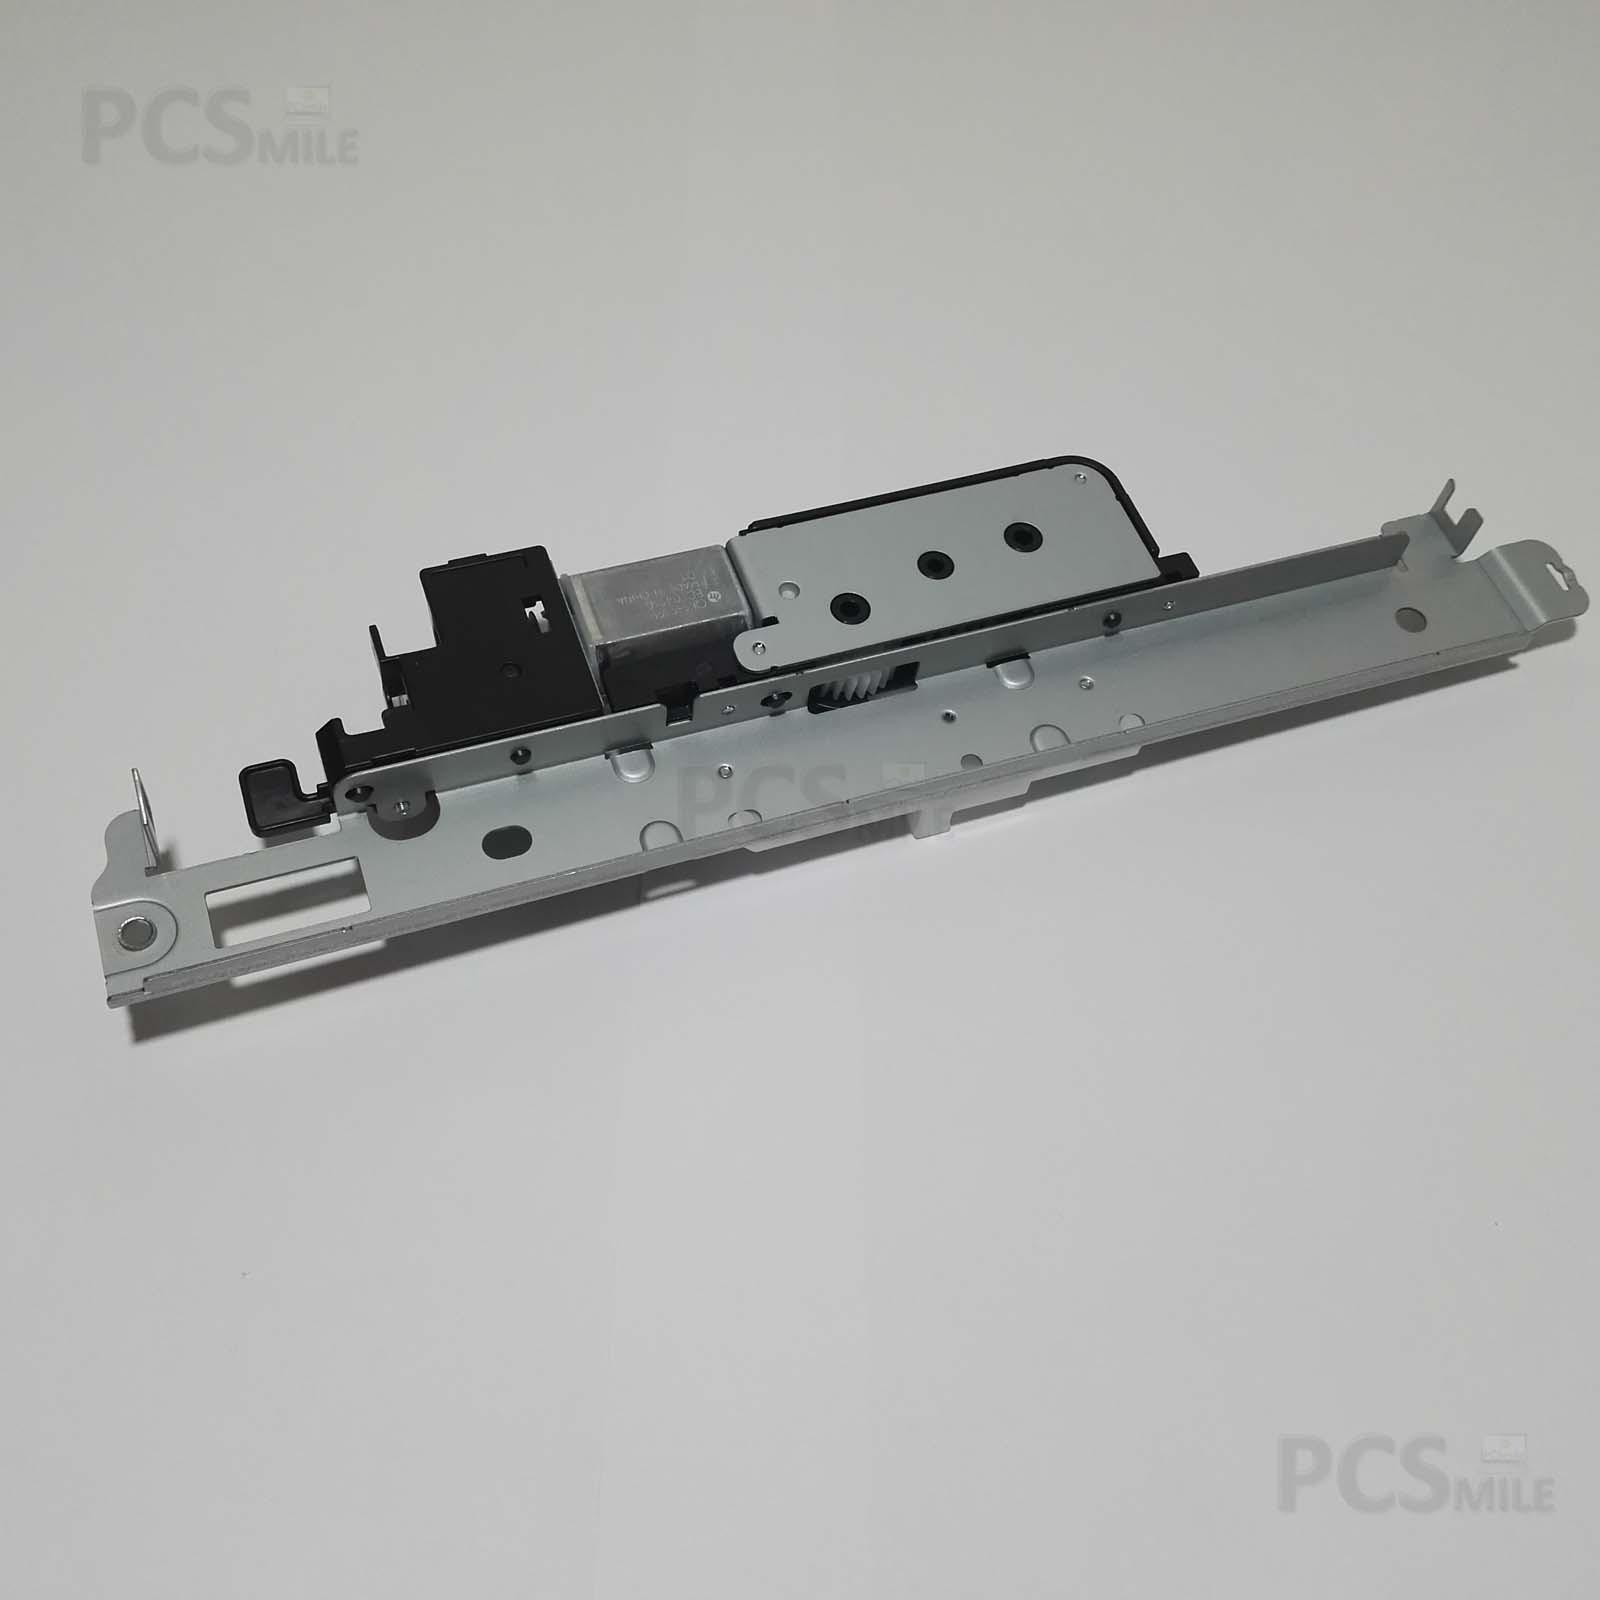 Motorino scanner QK1-9199 Canon Pixma MG6450 QK2-0183, QM7-2856 supporto